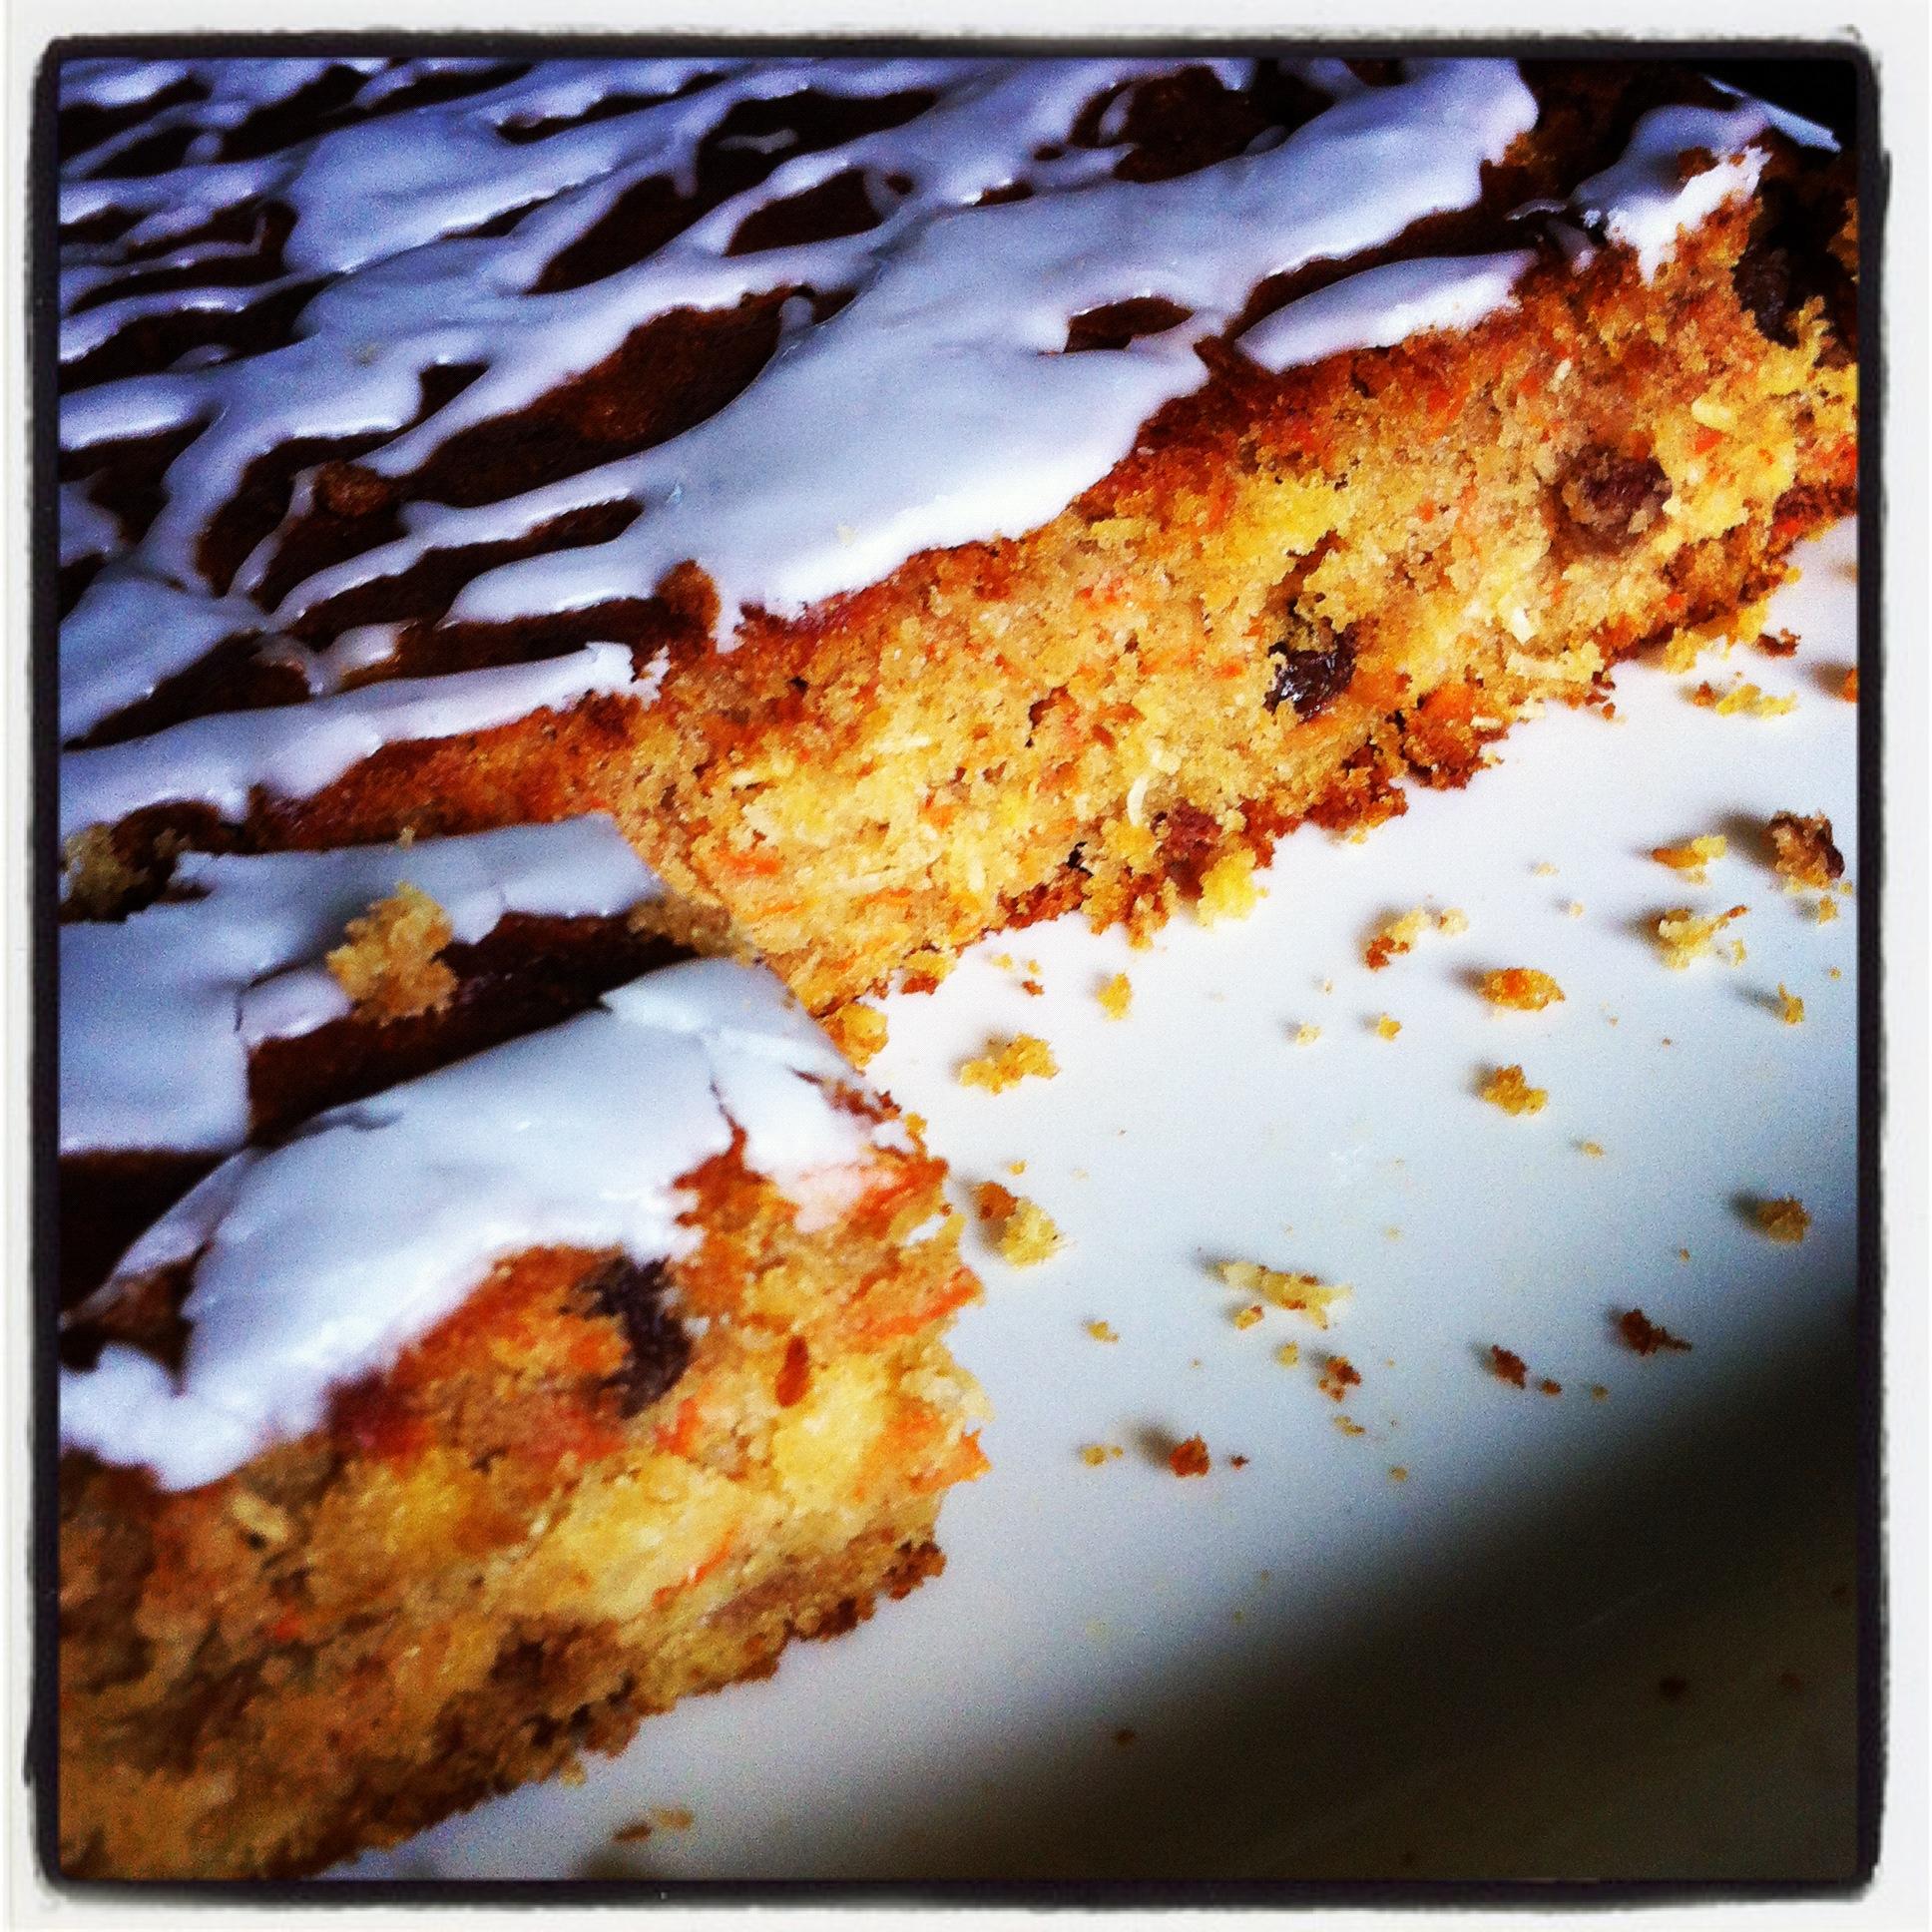 Queen Of Heaven Makes Cakes